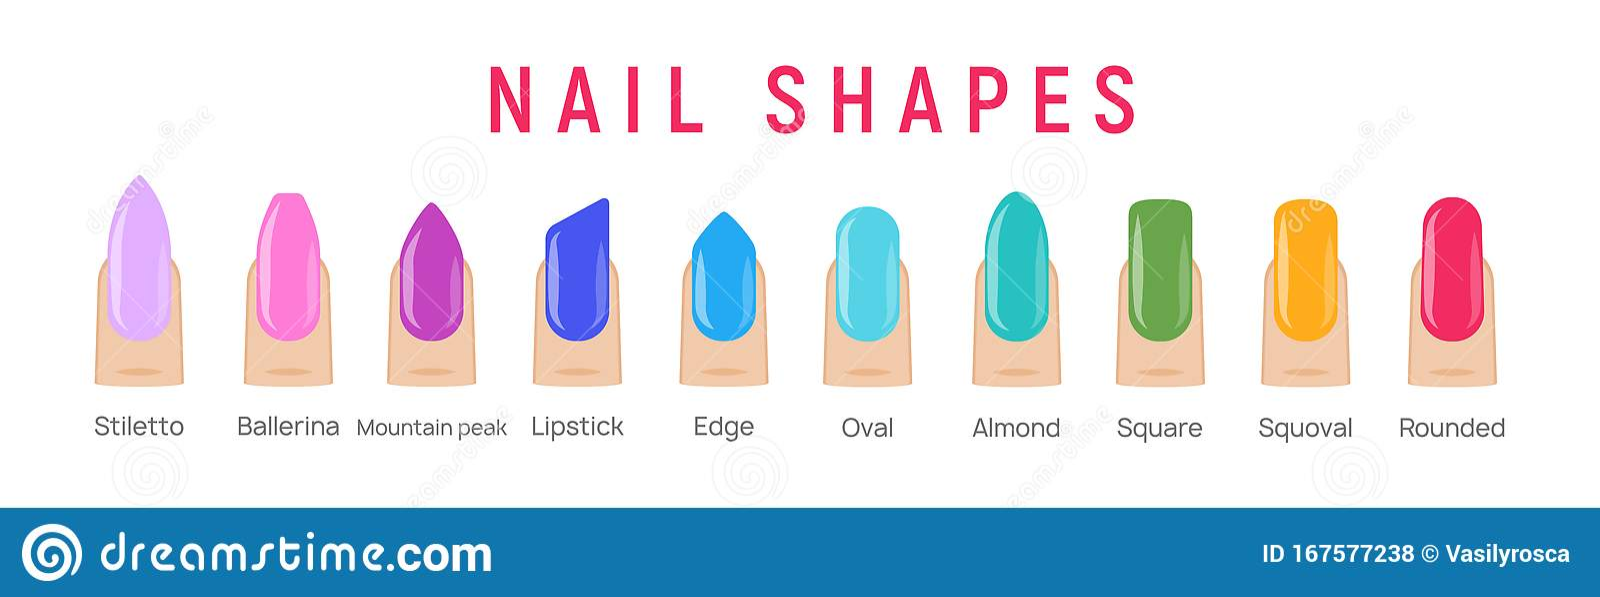 Nail Shapes Manicure Vector Art Fingernail Shape French Form Design Fashion Salon Stock Vector Illustration Of Girl French 167577238